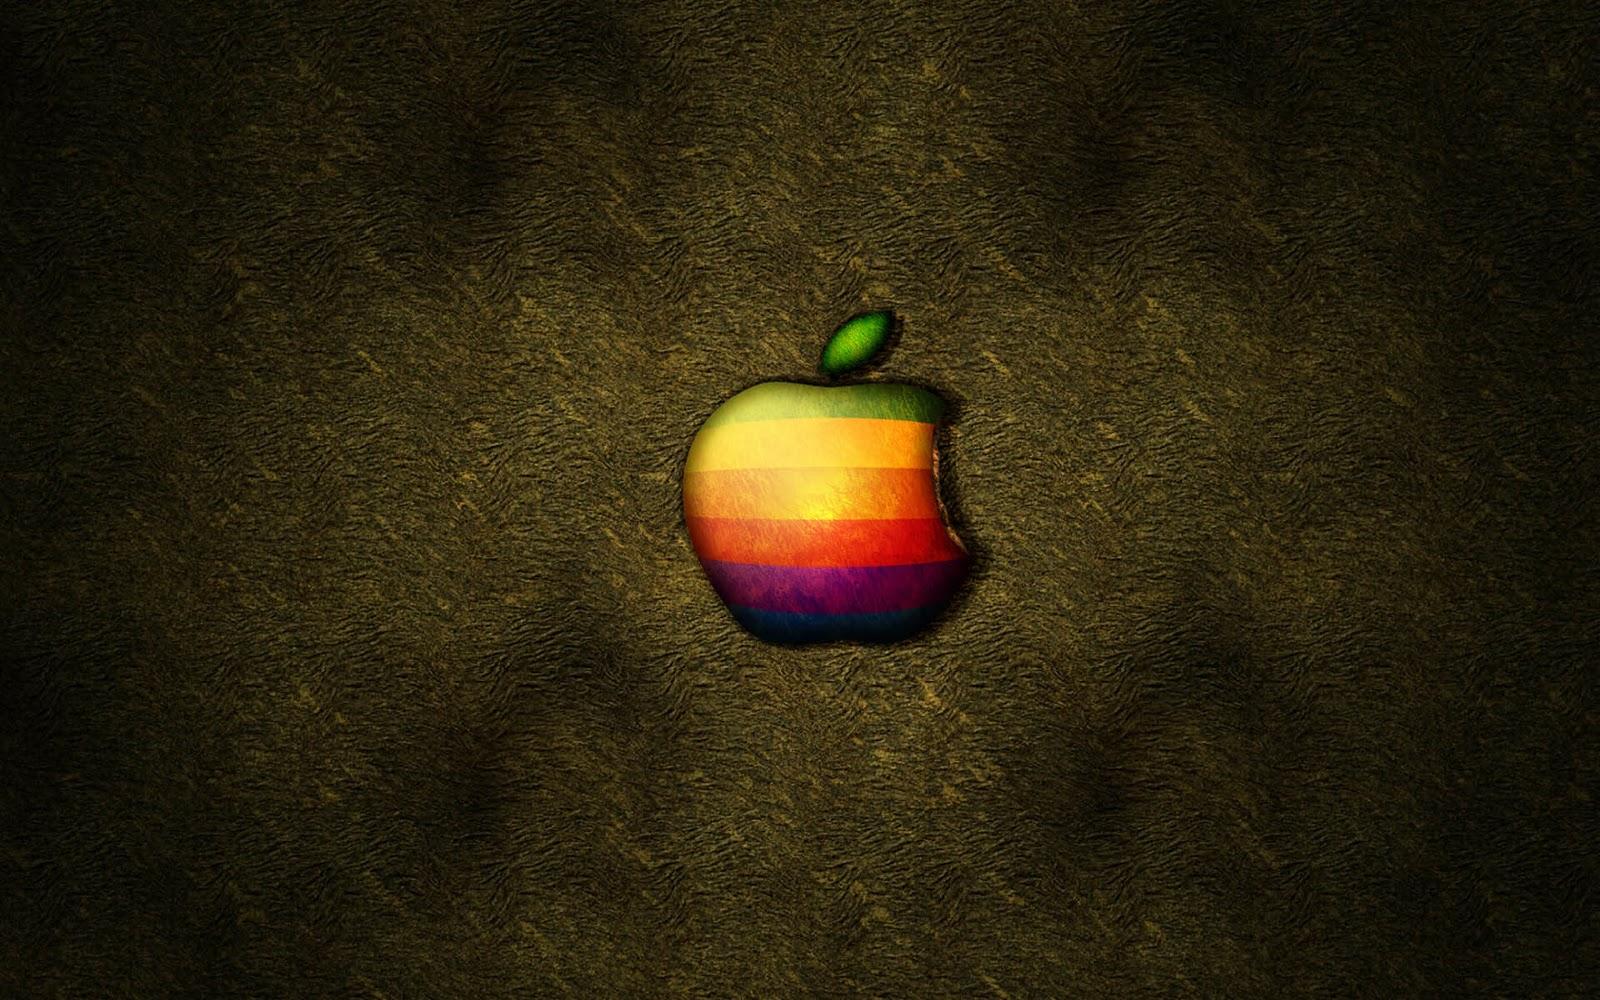 http://3.bp.blogspot.com/-wrY2WlSrUms/TsRs5hvrLWI/AAAAAAAAAeE/HK48tQBV-CY/s1600/Apple+17.jpg